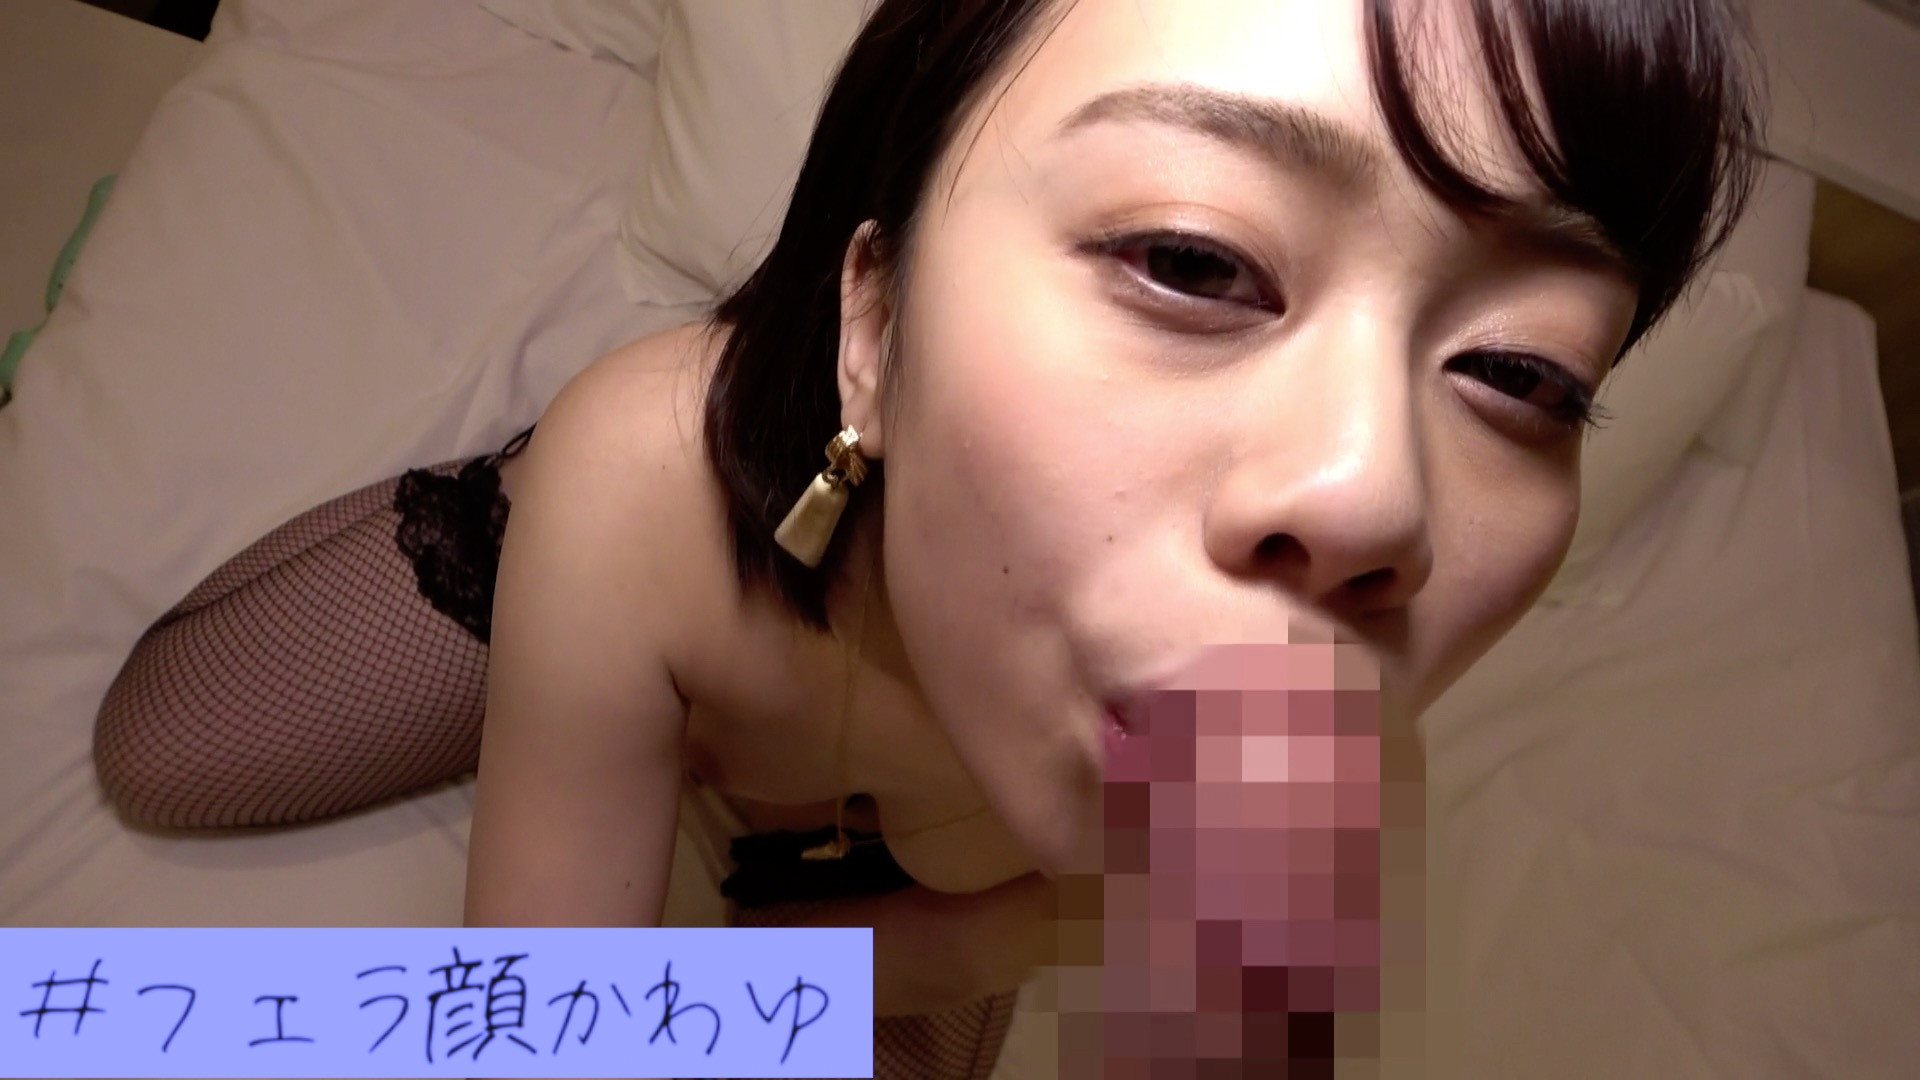 【SSS級美少女 初ハメ撮り】激かわJDをホテルに連れ込みF○CK!高速ピストンでかわいい顔を歪ませる 画像10